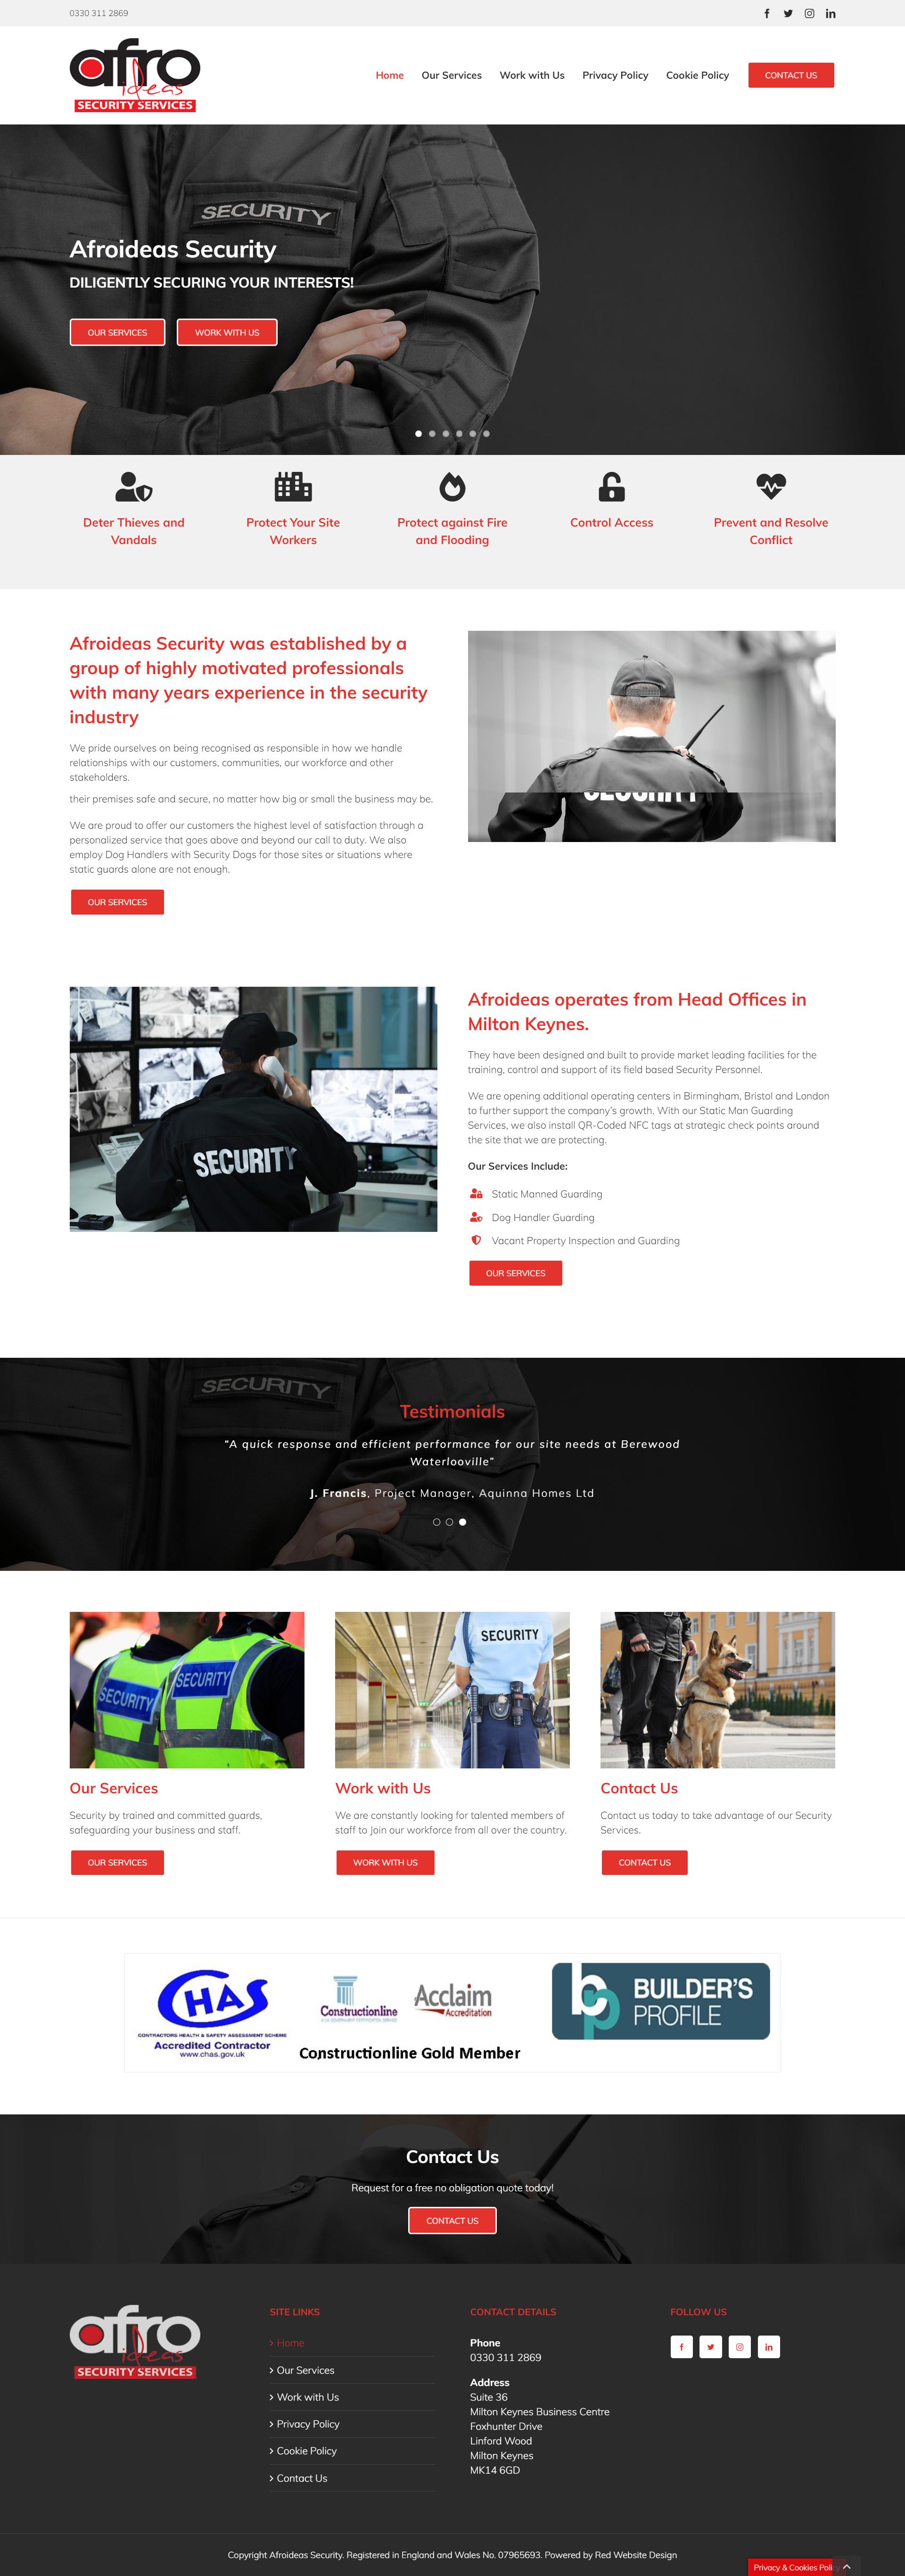 Web Design Bletchley